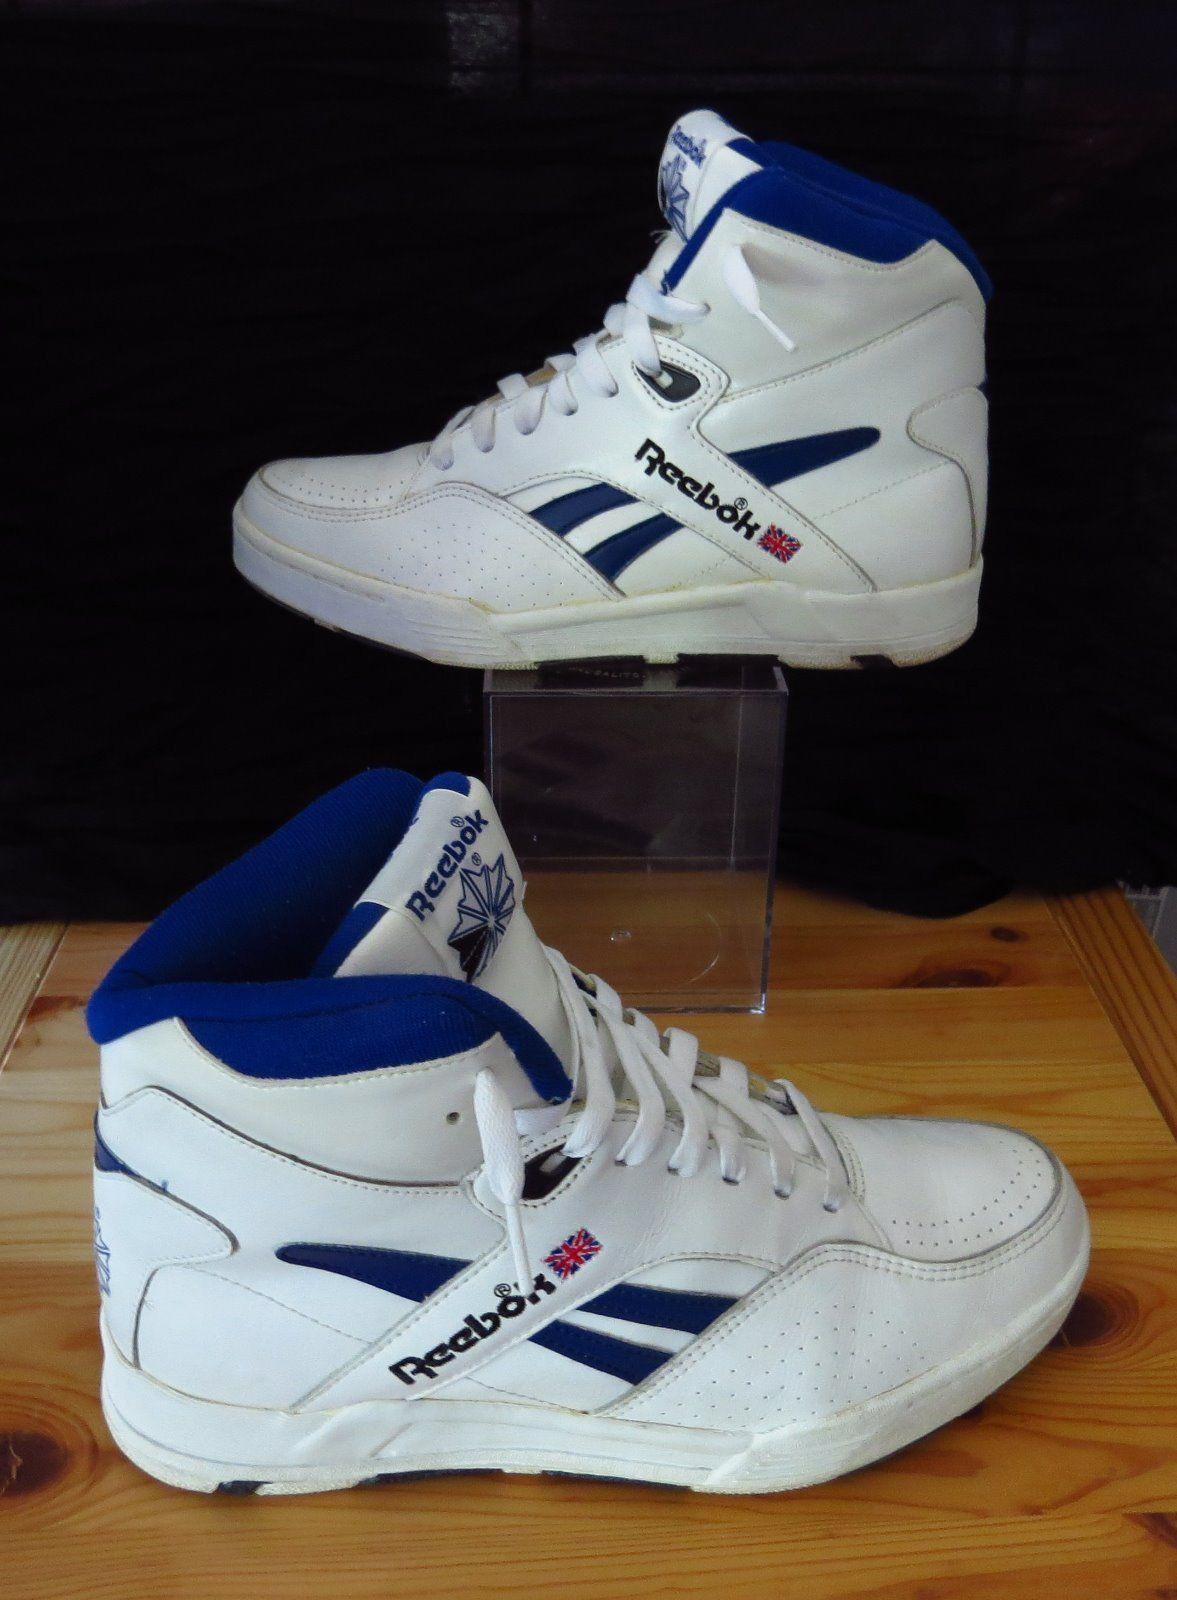 3efd39cd8 Vintage Reebok BB 4600 Ultra Hi 4 6336 White Royal Blue Black Men's US Size  7 | eBay